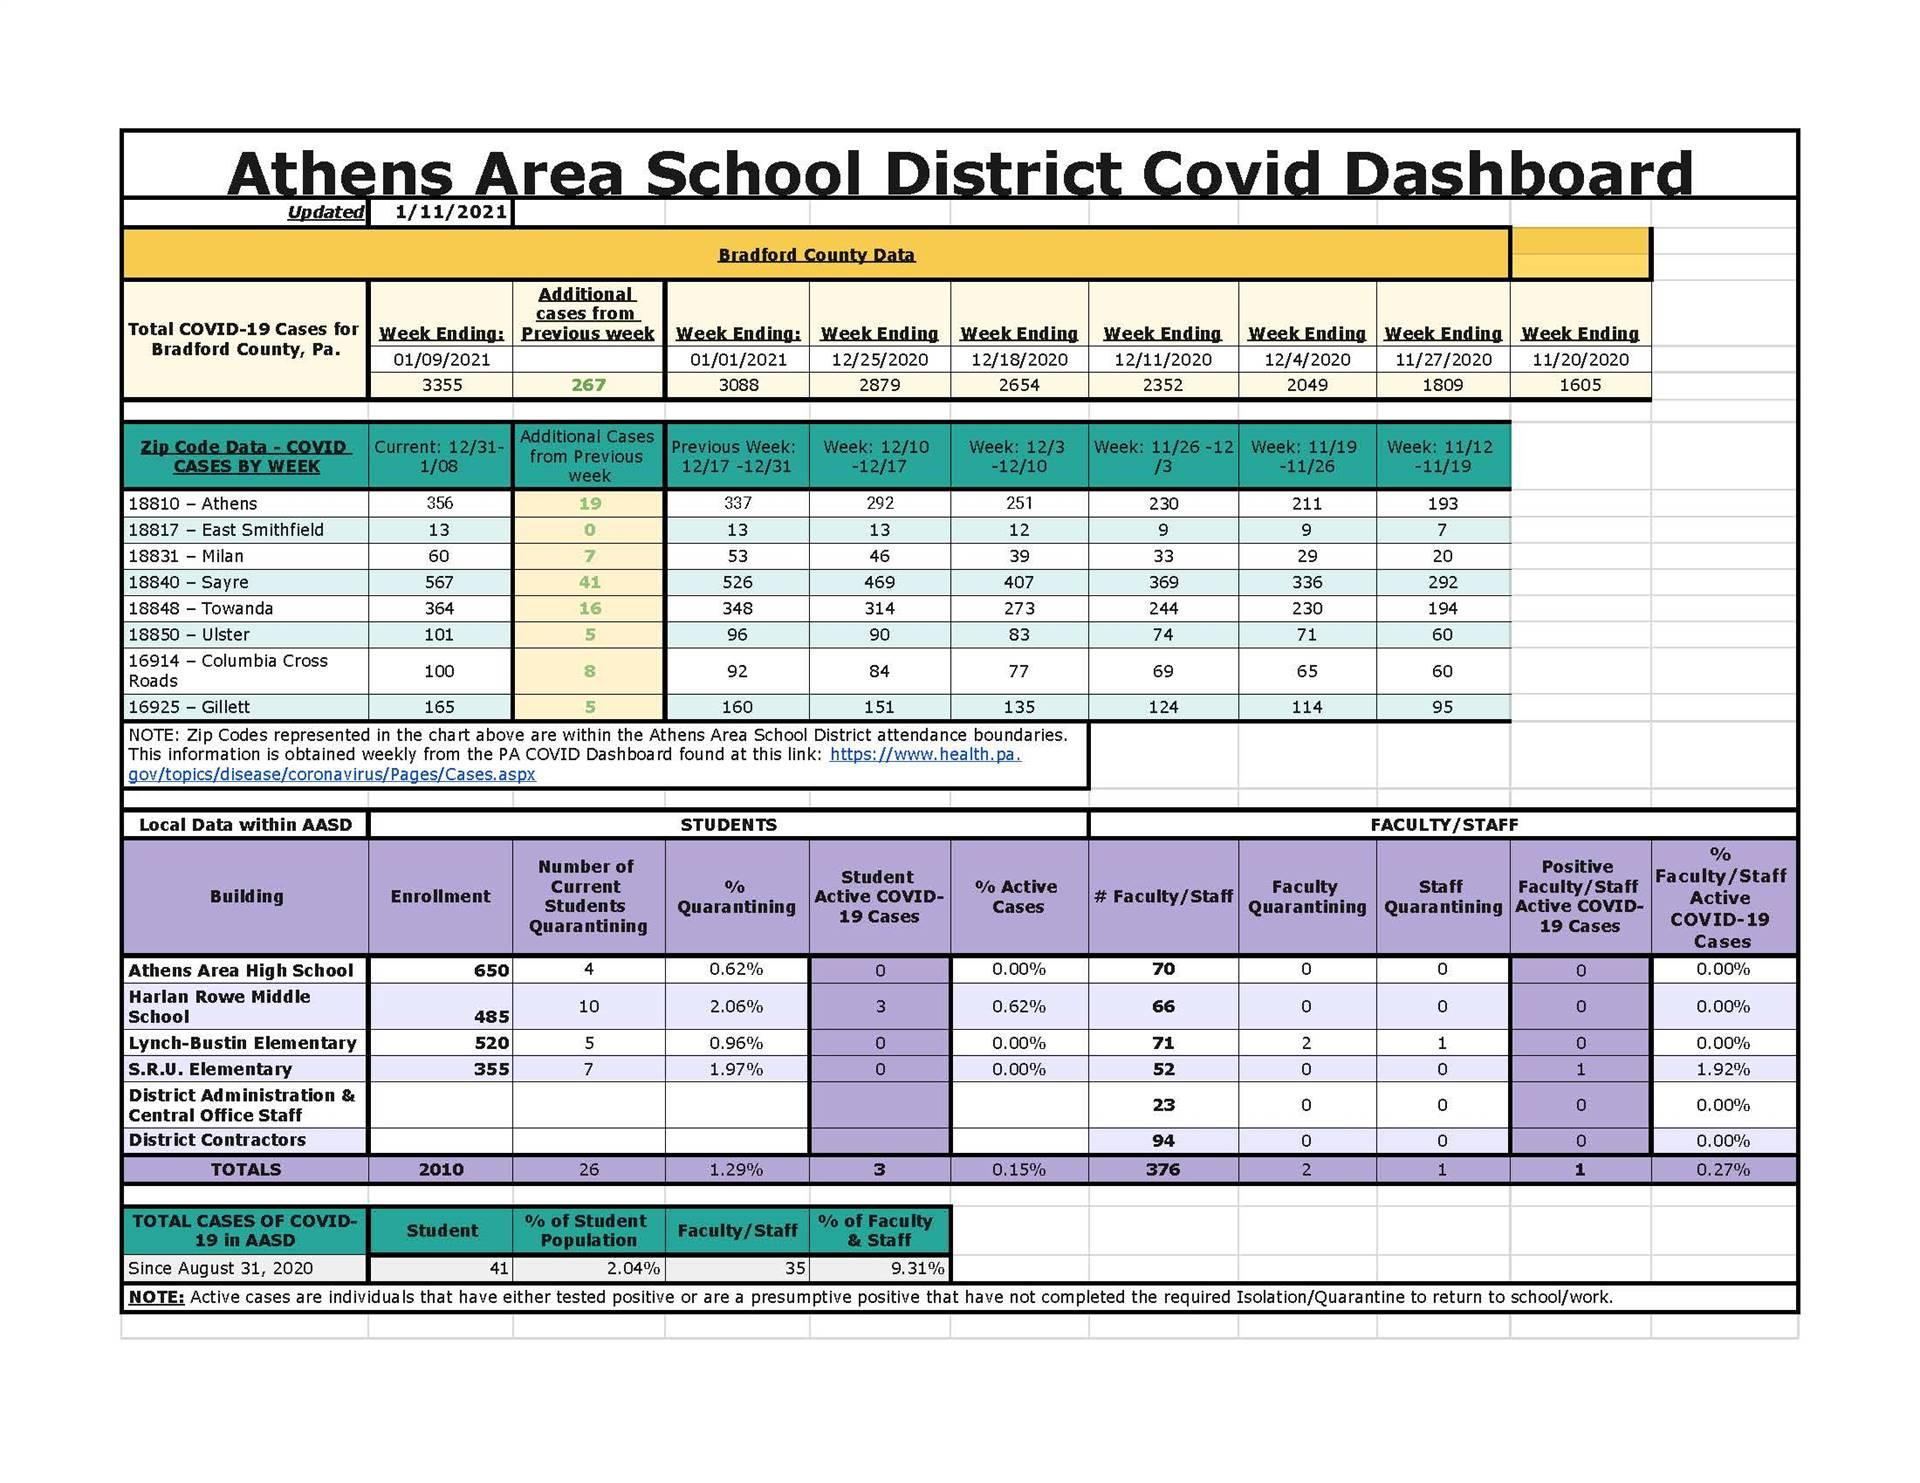 AASD COVID Dashboard 01.11.2021